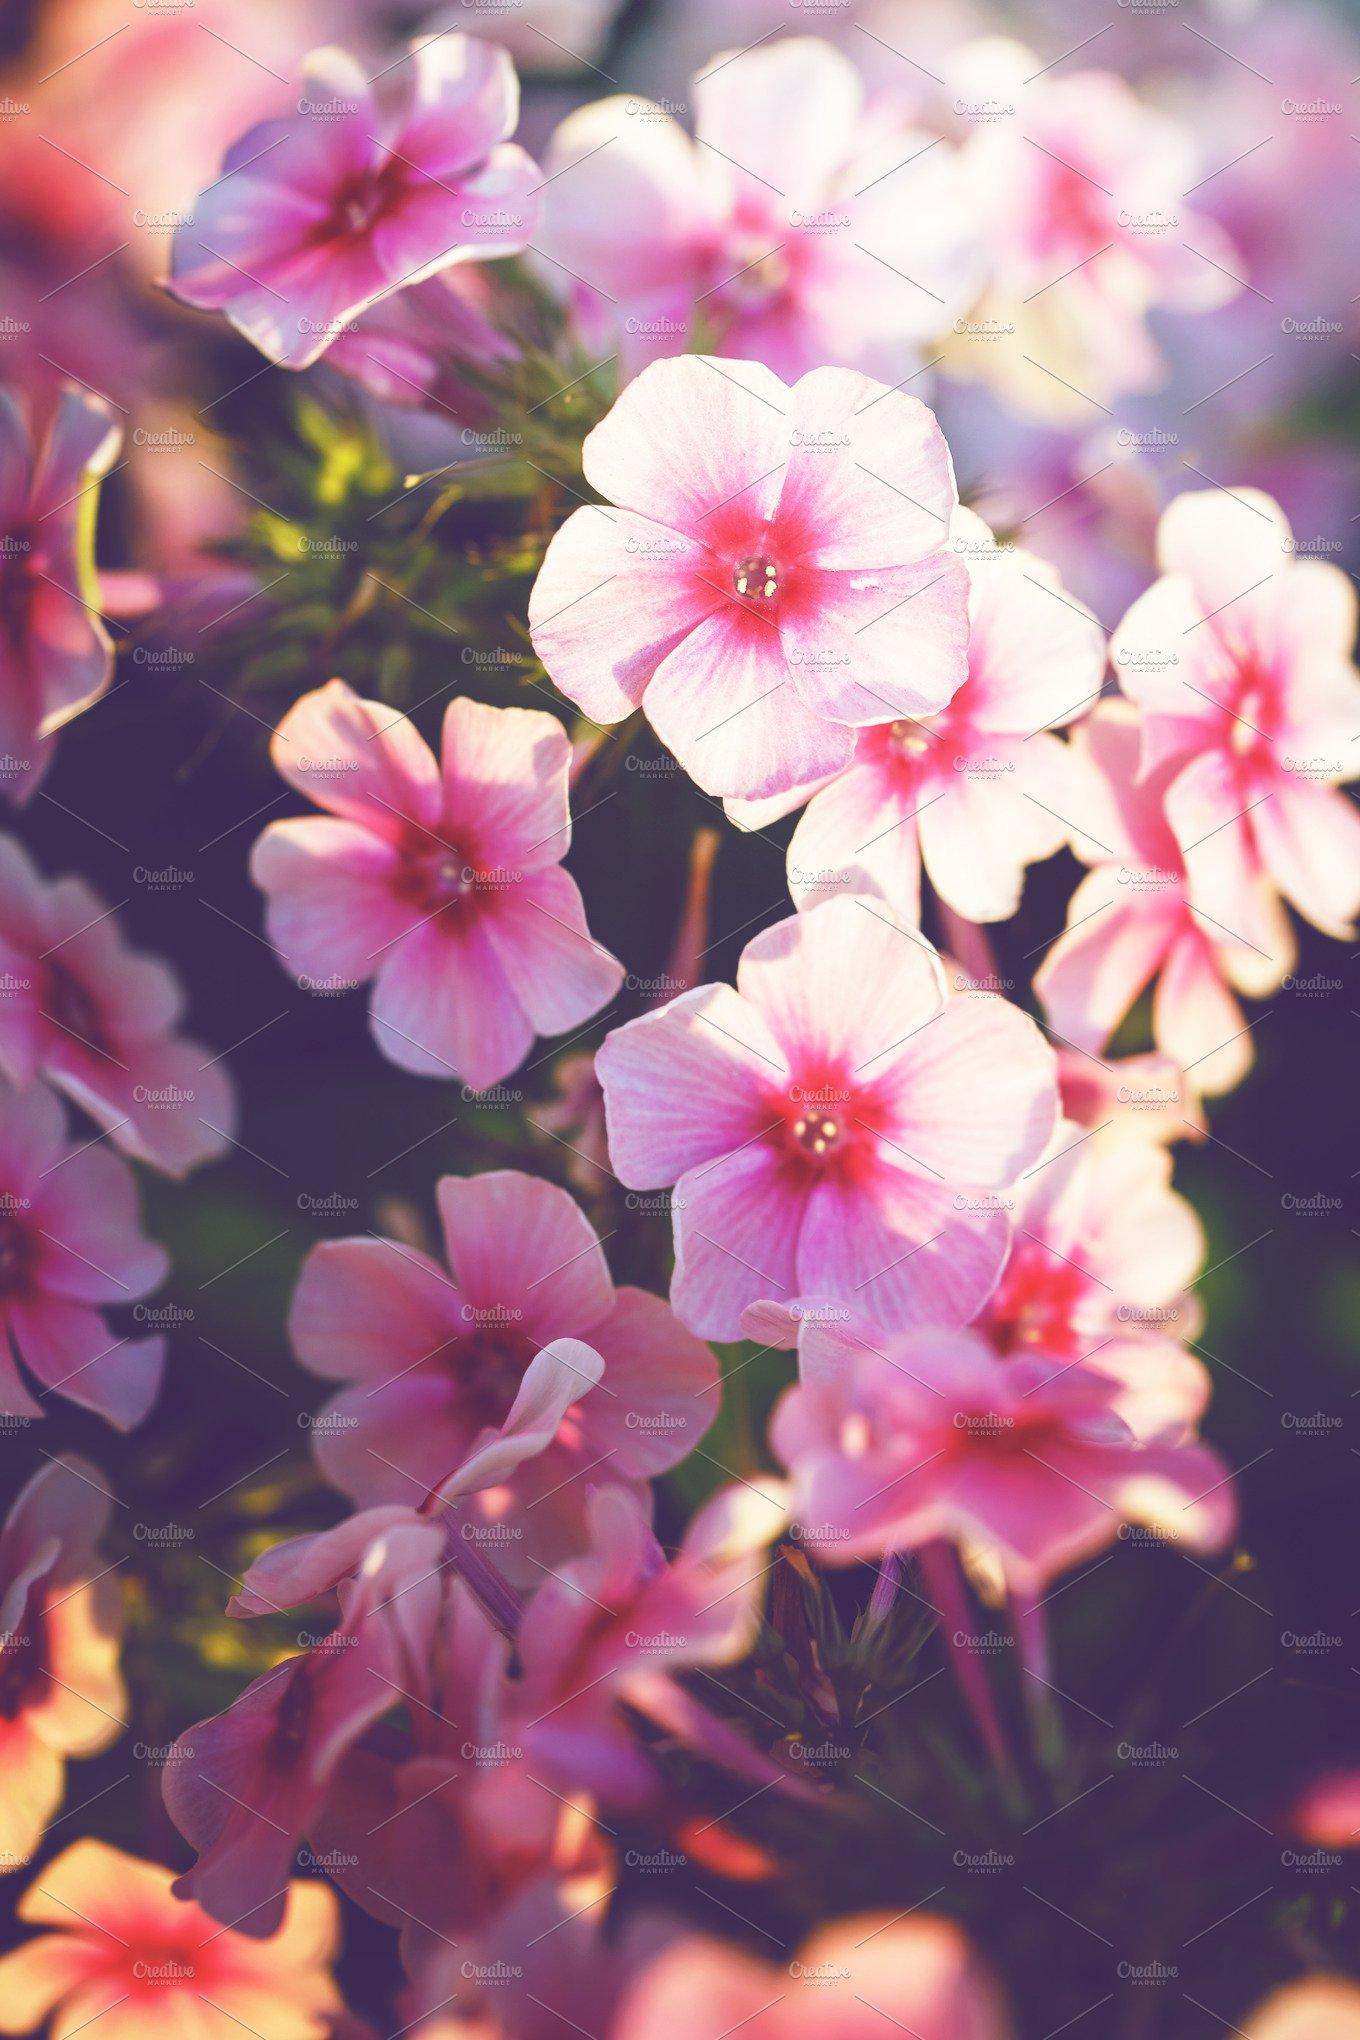 Vintage picture of pink little flowers an morning soft light in vintage picture of pink little flowers an morning soft light in garden flowerbed autumn outdoor nature macro photo nature photos creative market mightylinksfo